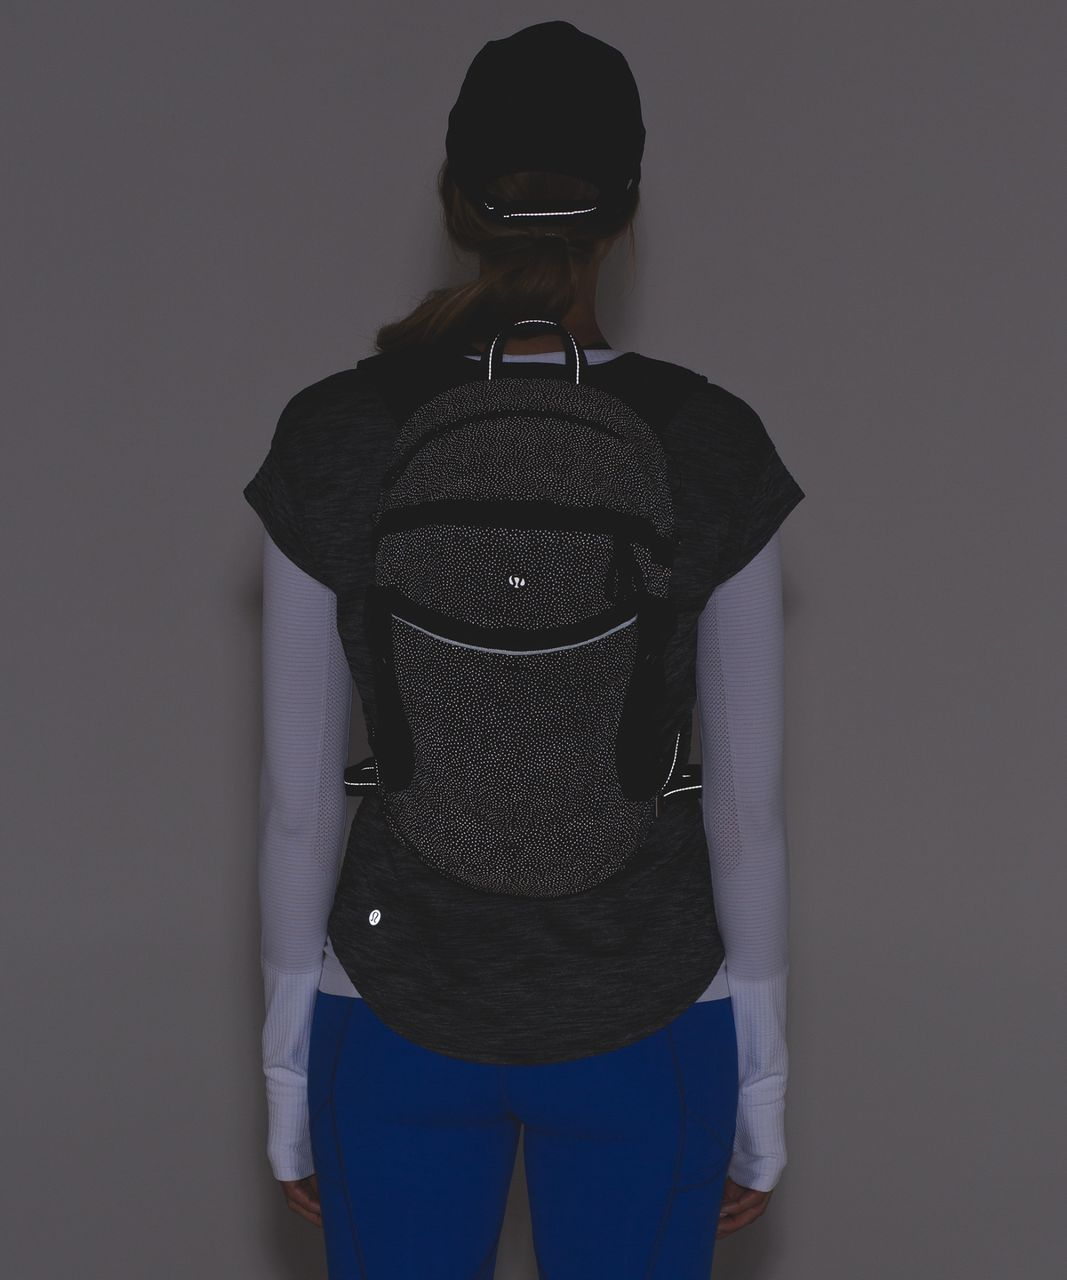 Lululemon Run All Day Backpack (Reflective) - Frozen Fizz Reflective Silver